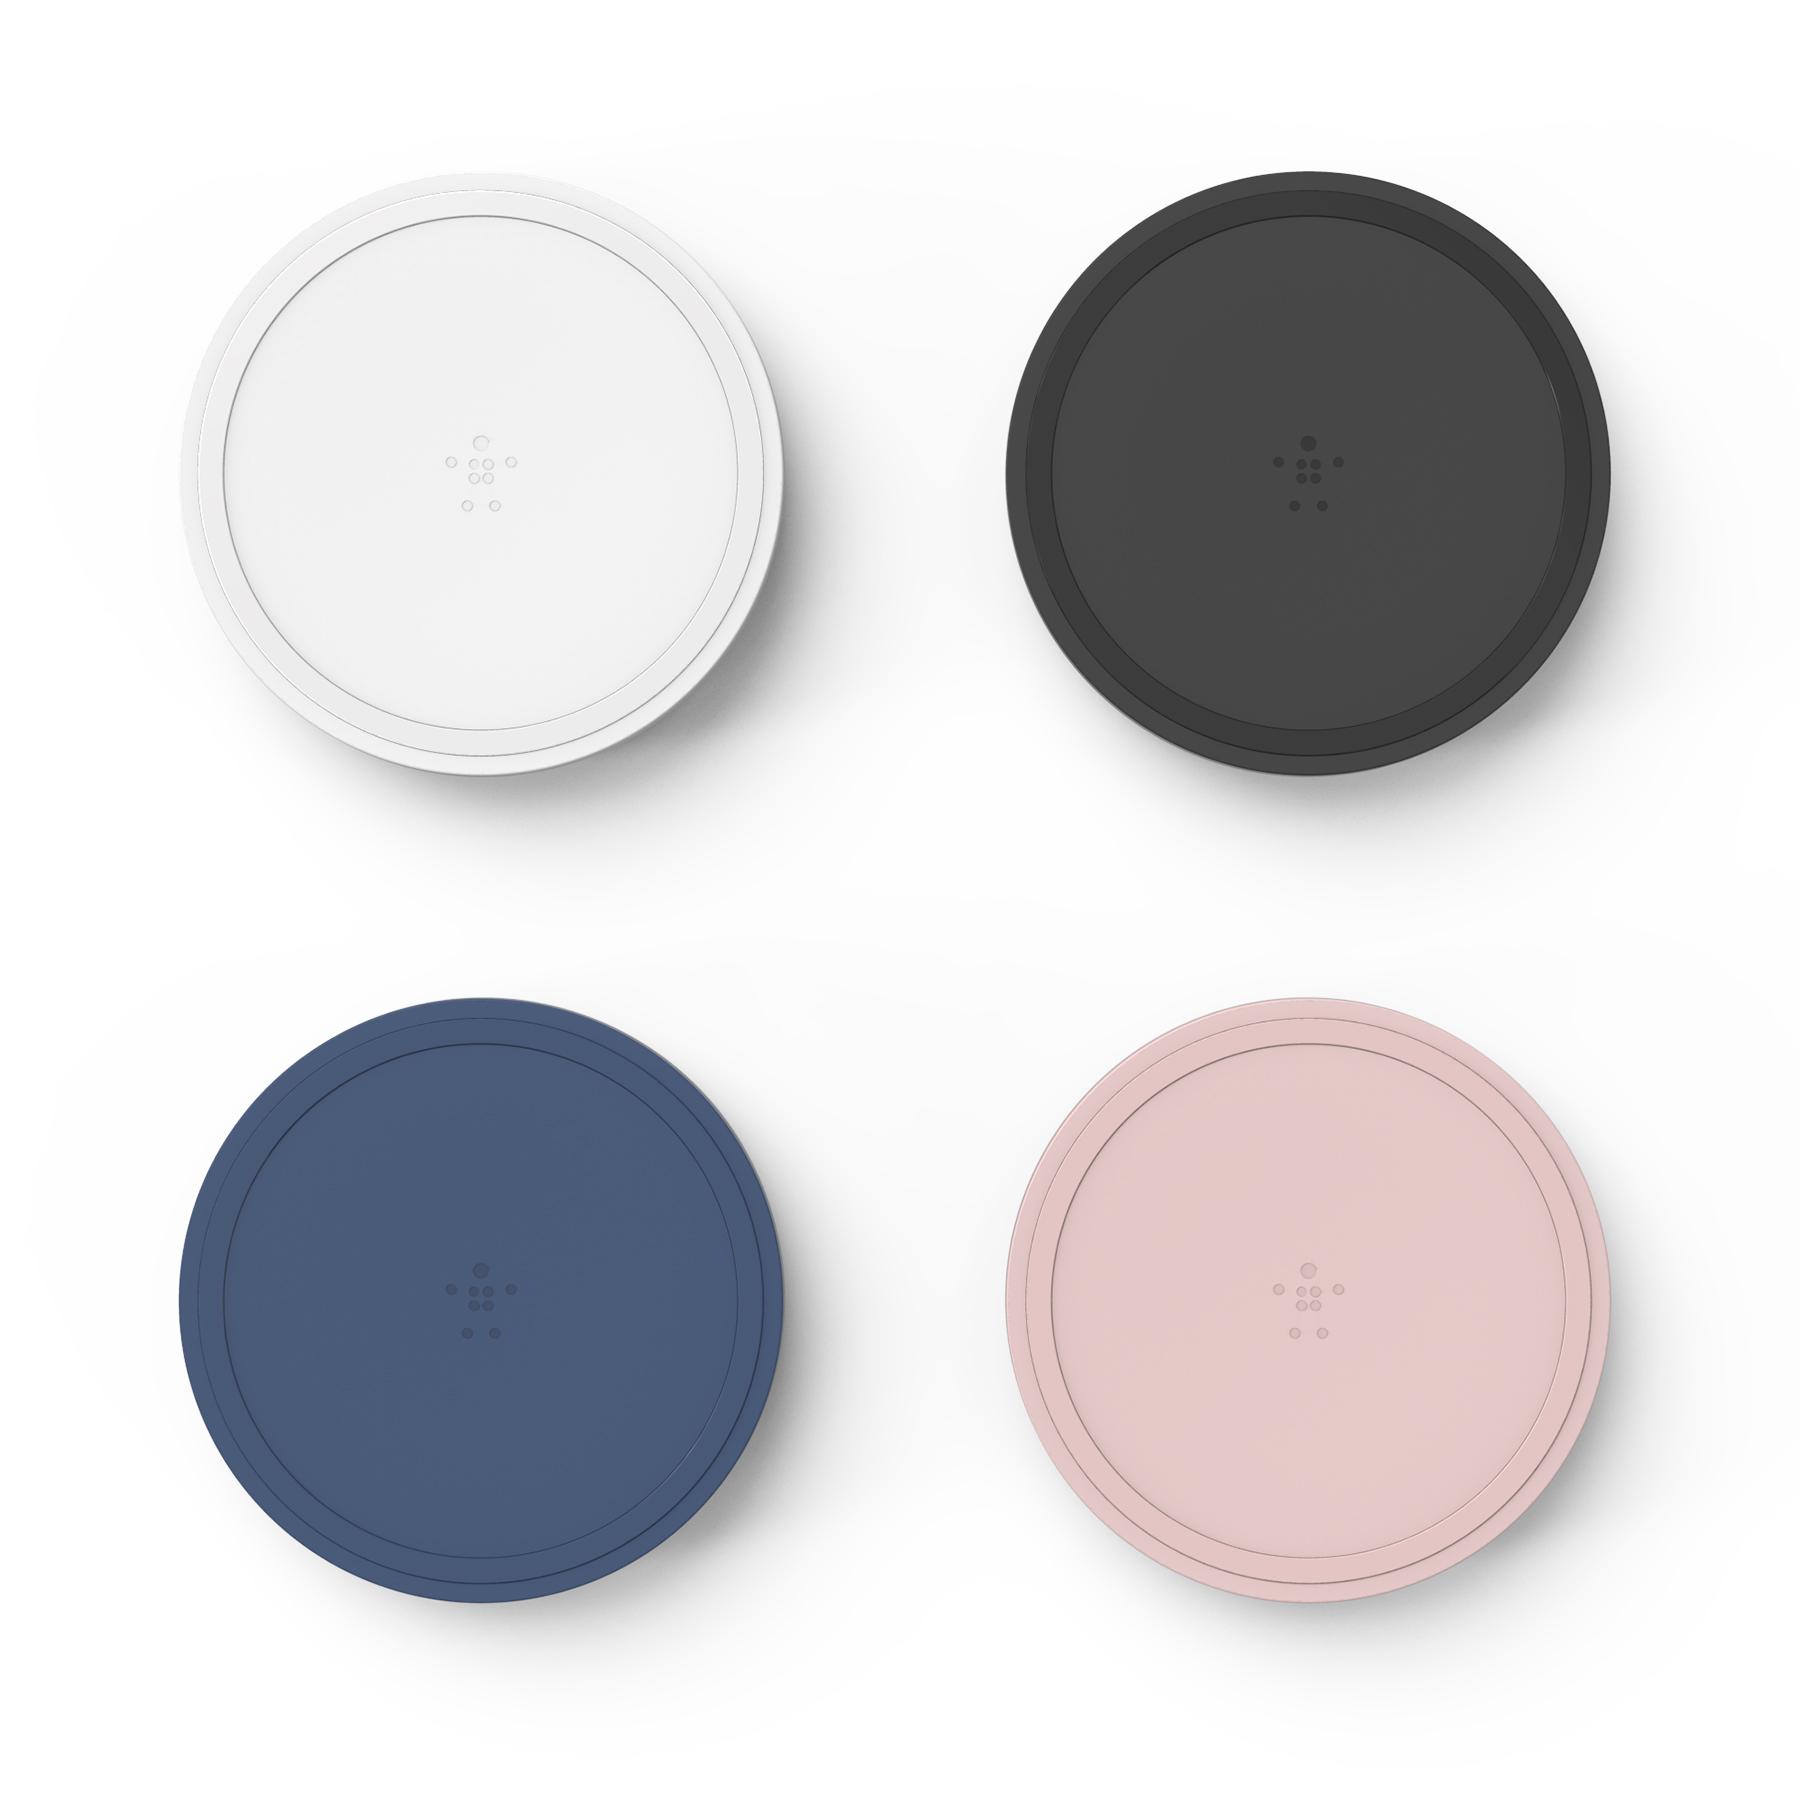 Bold_Charging_Pad_Color_2.jpg